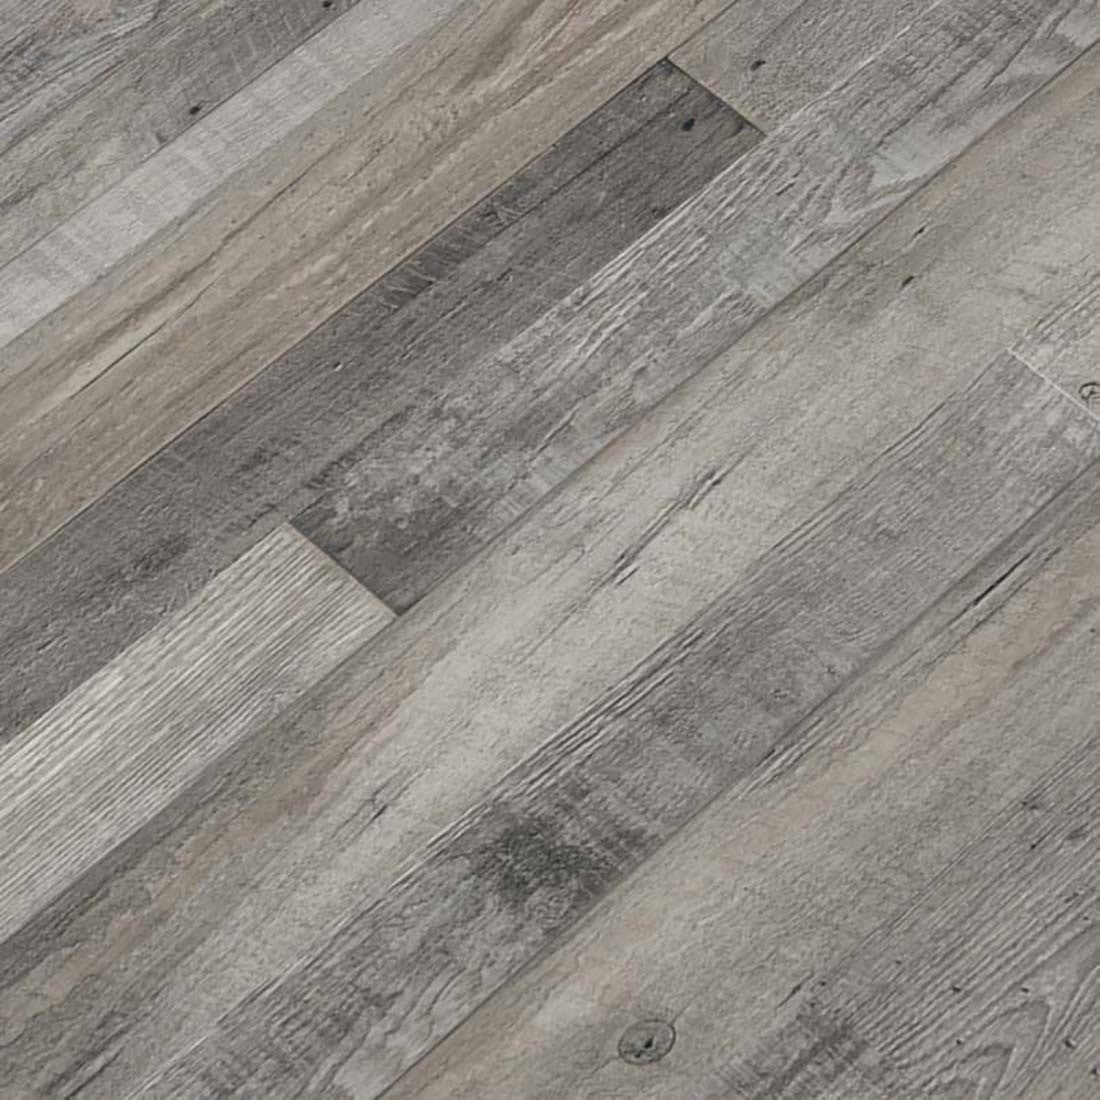 China Phthalate Free Spc Wpc Lvt, Vinyl Waterproof Laminate Flooring